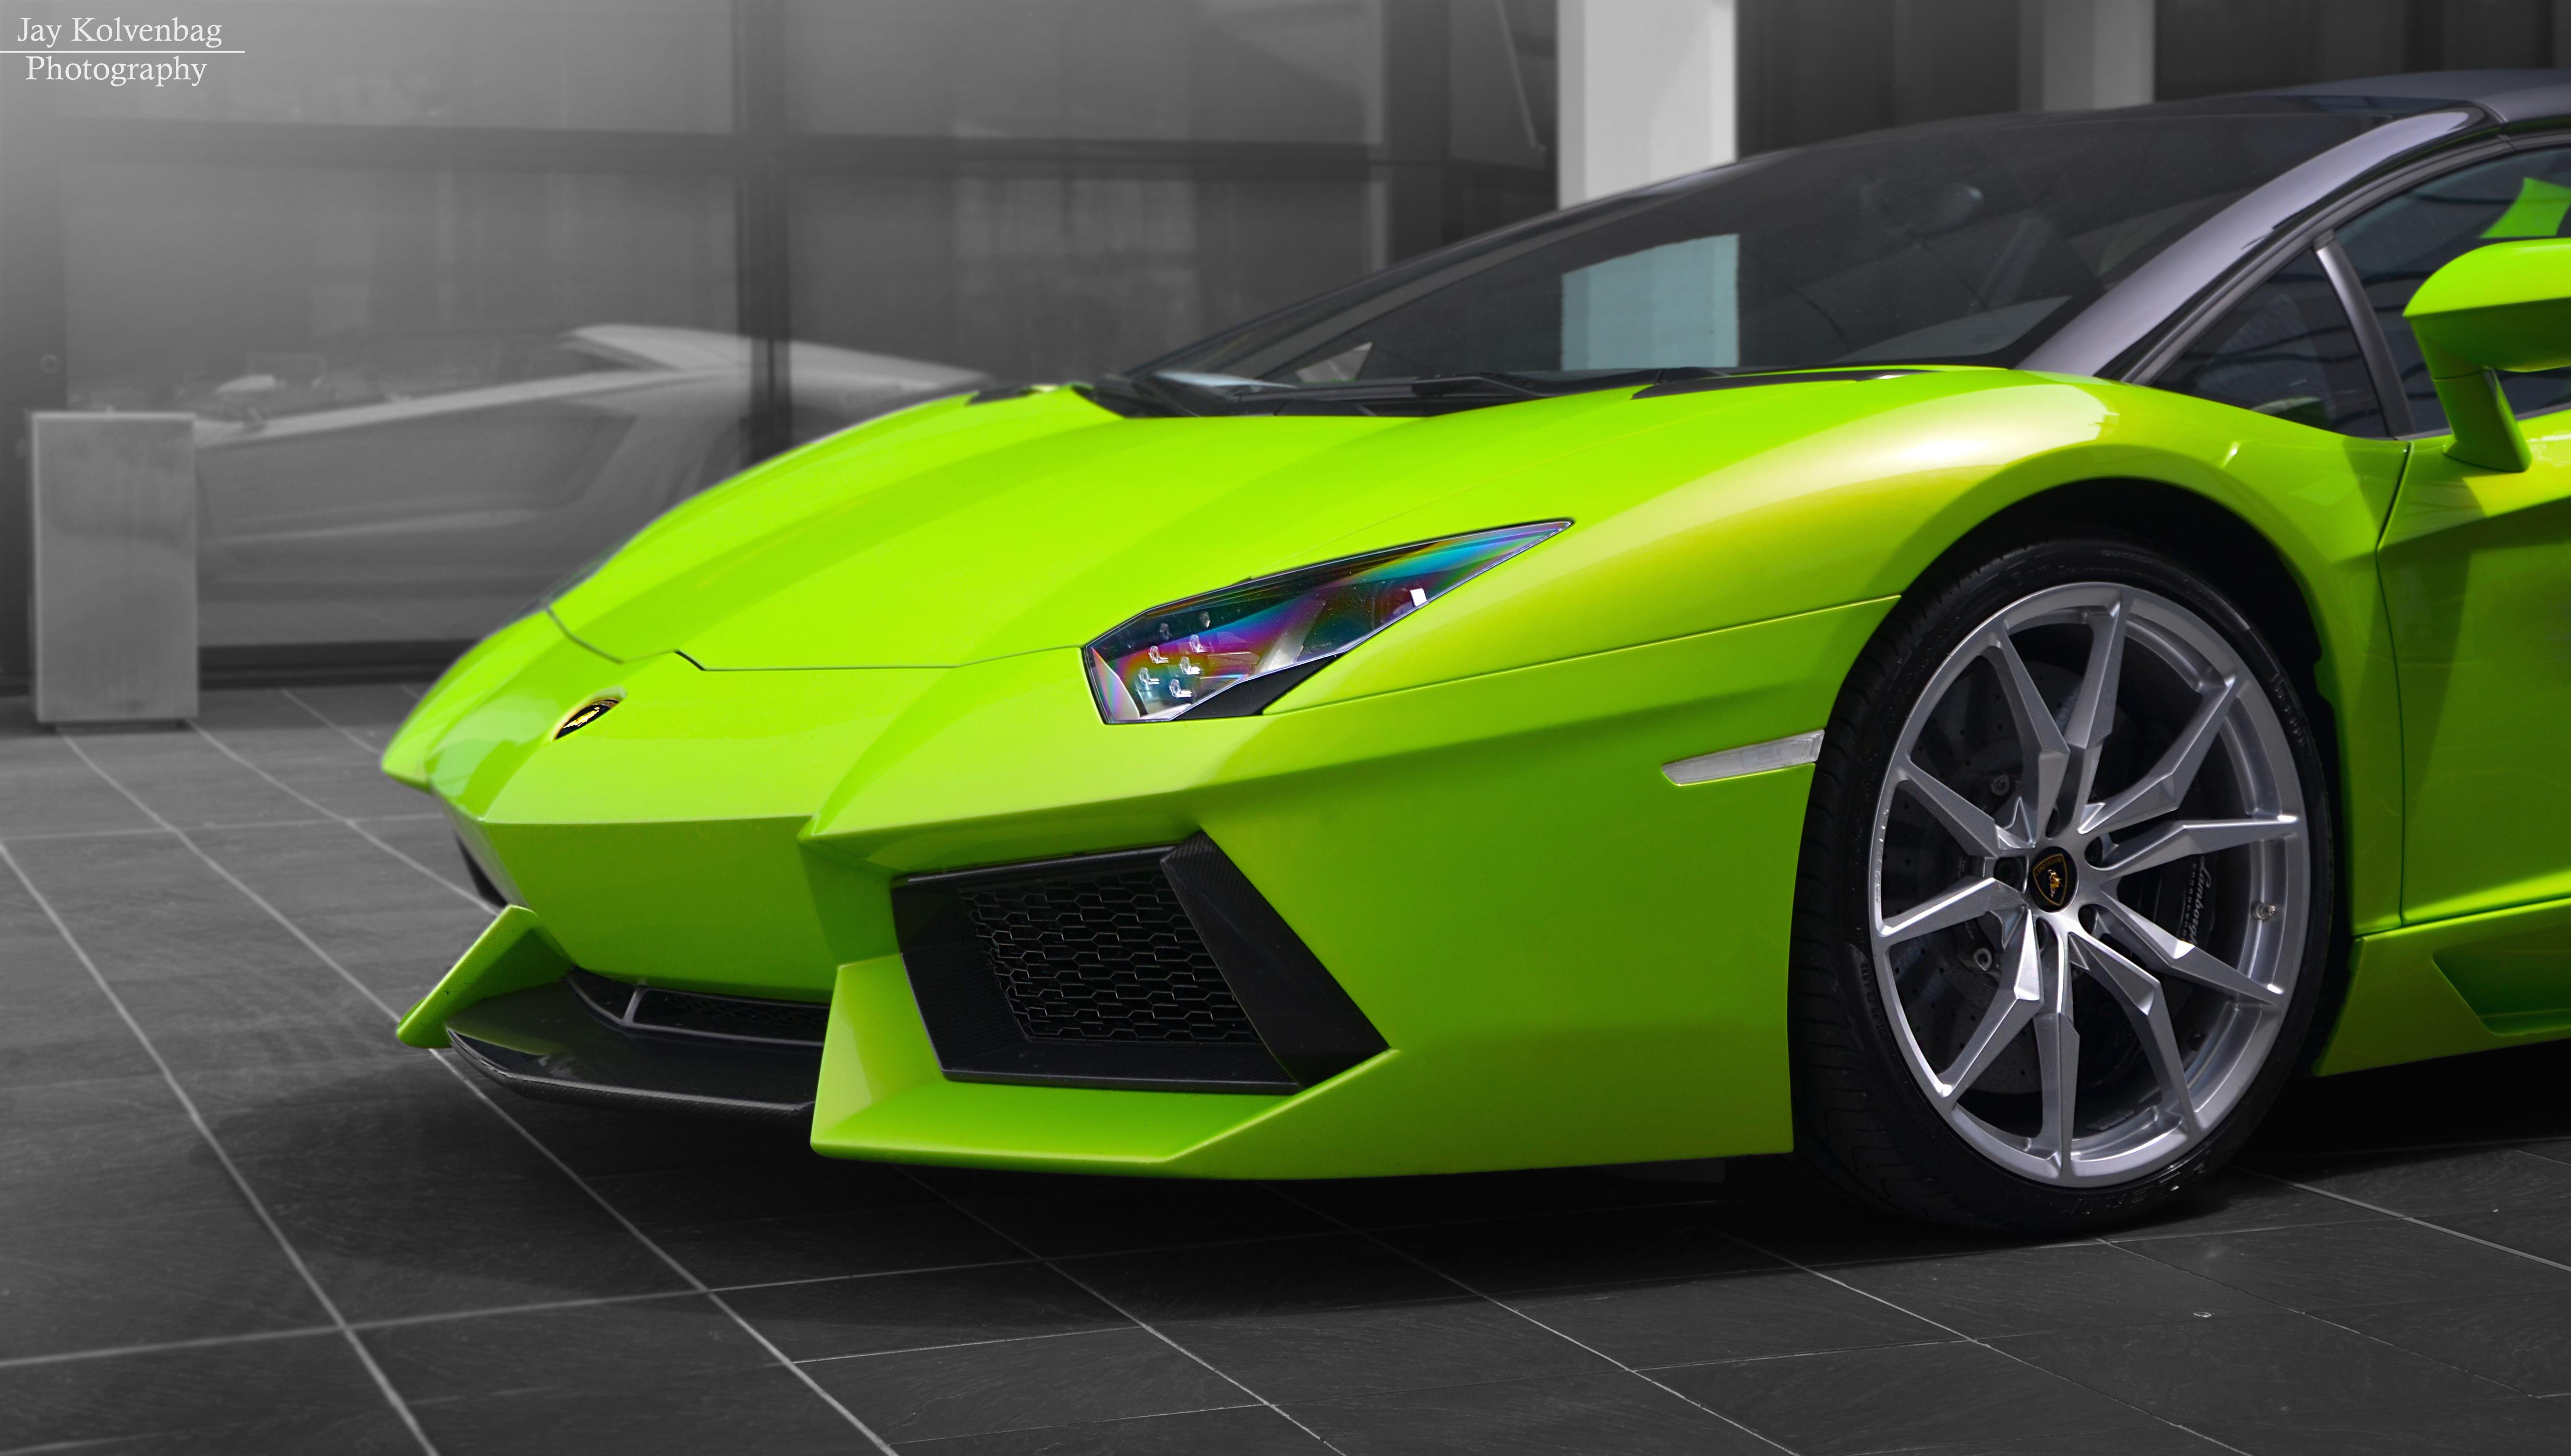 Wallpaper Photoshop Photography Green Lamborghini Aventador